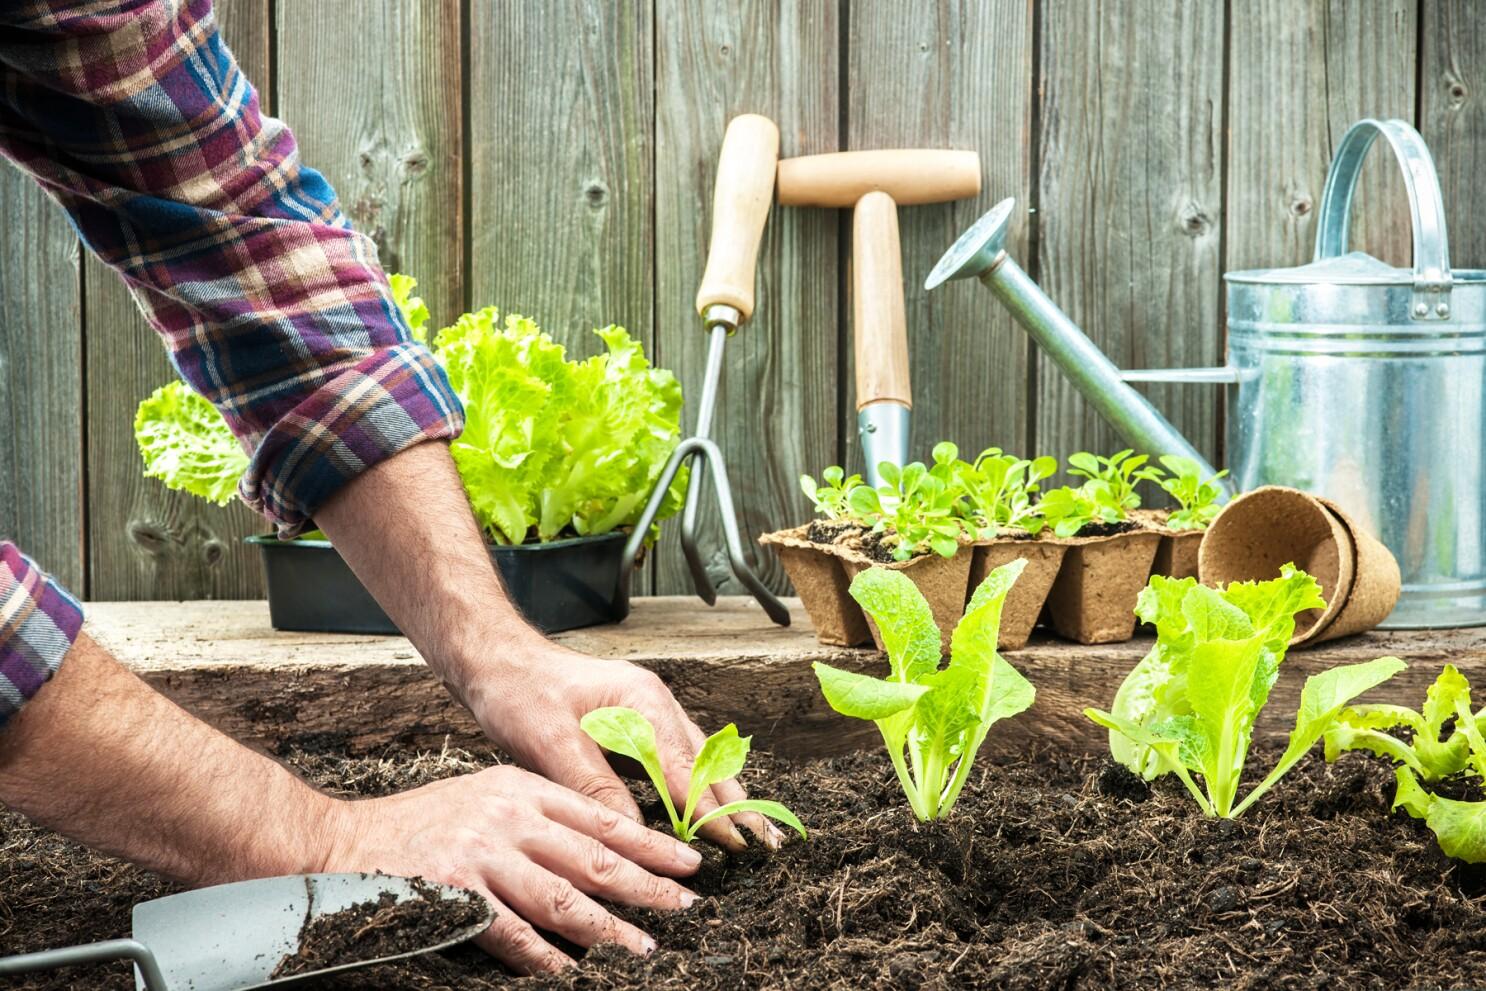 Gardening: What is organic gardening? (Part 2 of 2) - Pomerado News